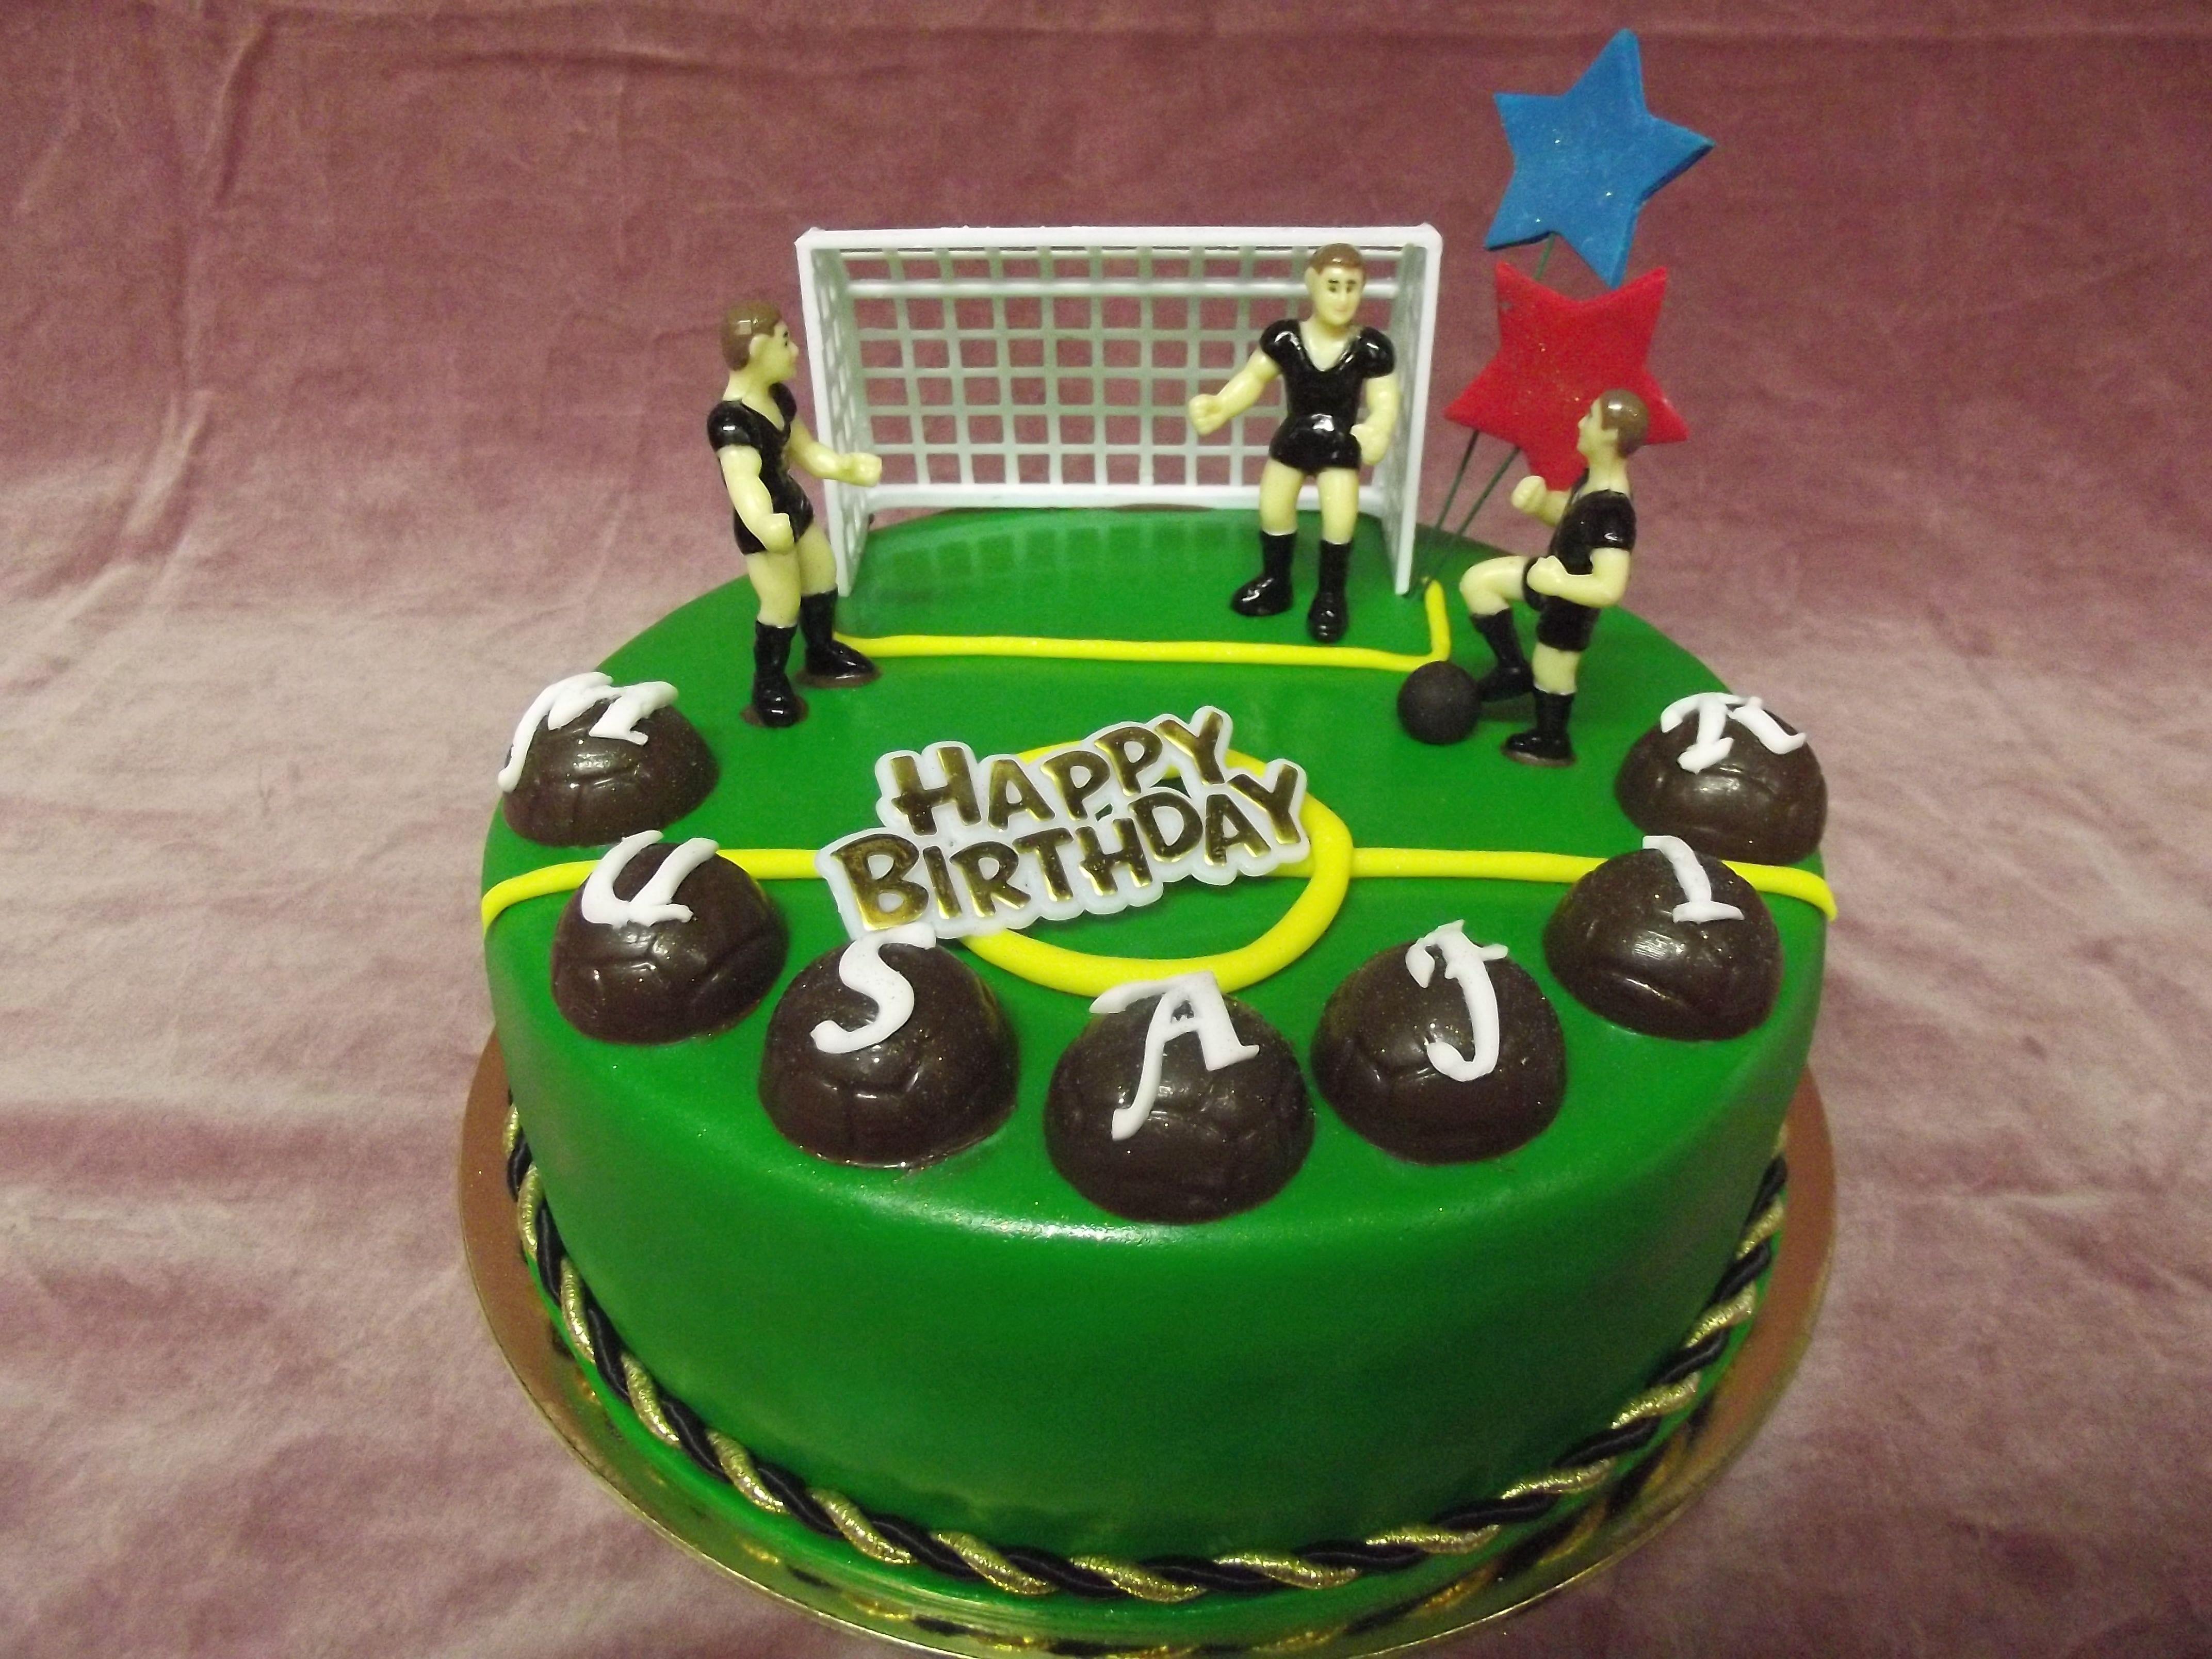 SOCCER THEMED CAKE Best Birthday Cakes in Auckland, New